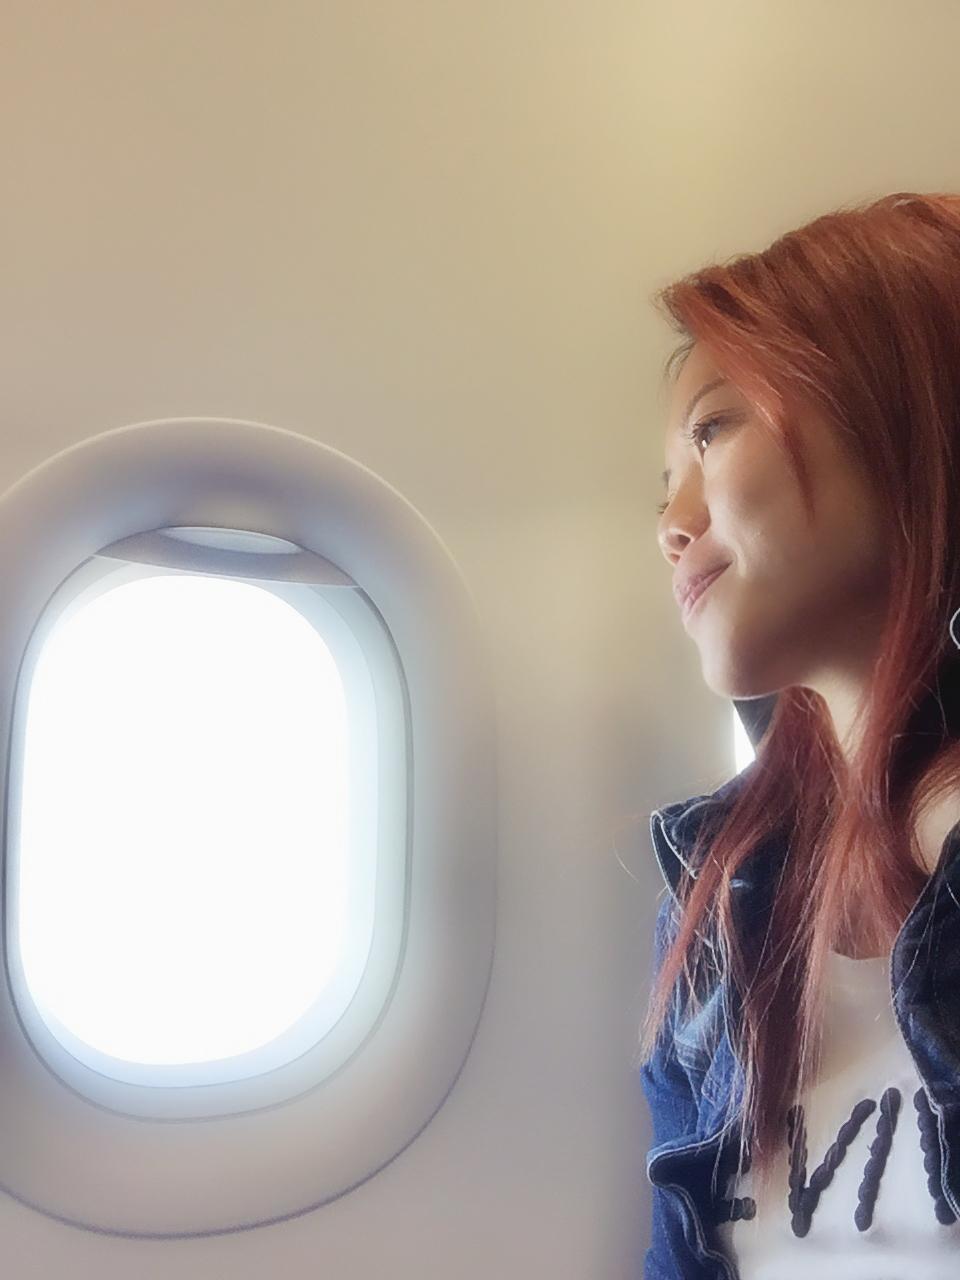 我的故事 - m'Solo Travel